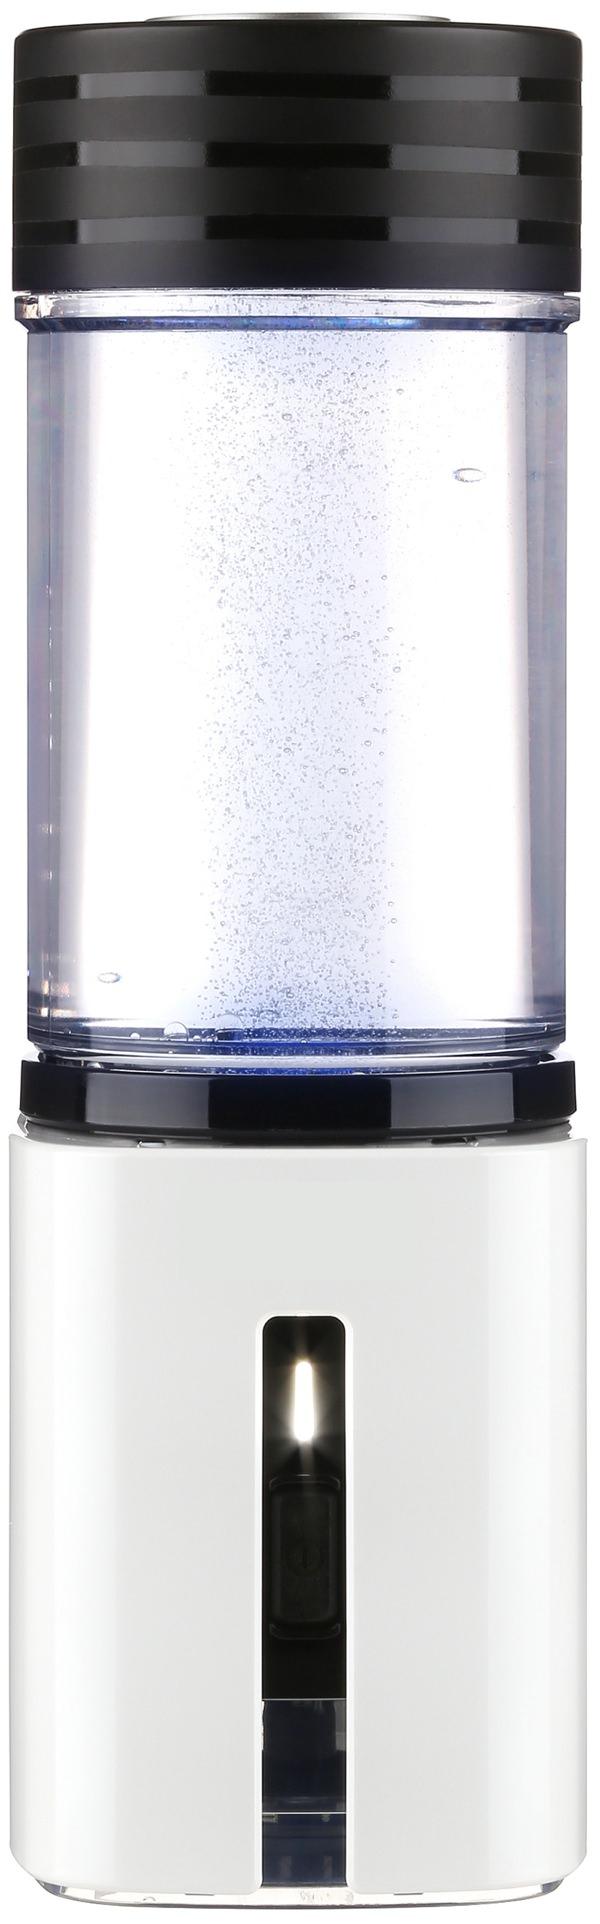 AquaVolta Wasserstoff Booster portable PEM Hydrogen generator mit Druckgefäß